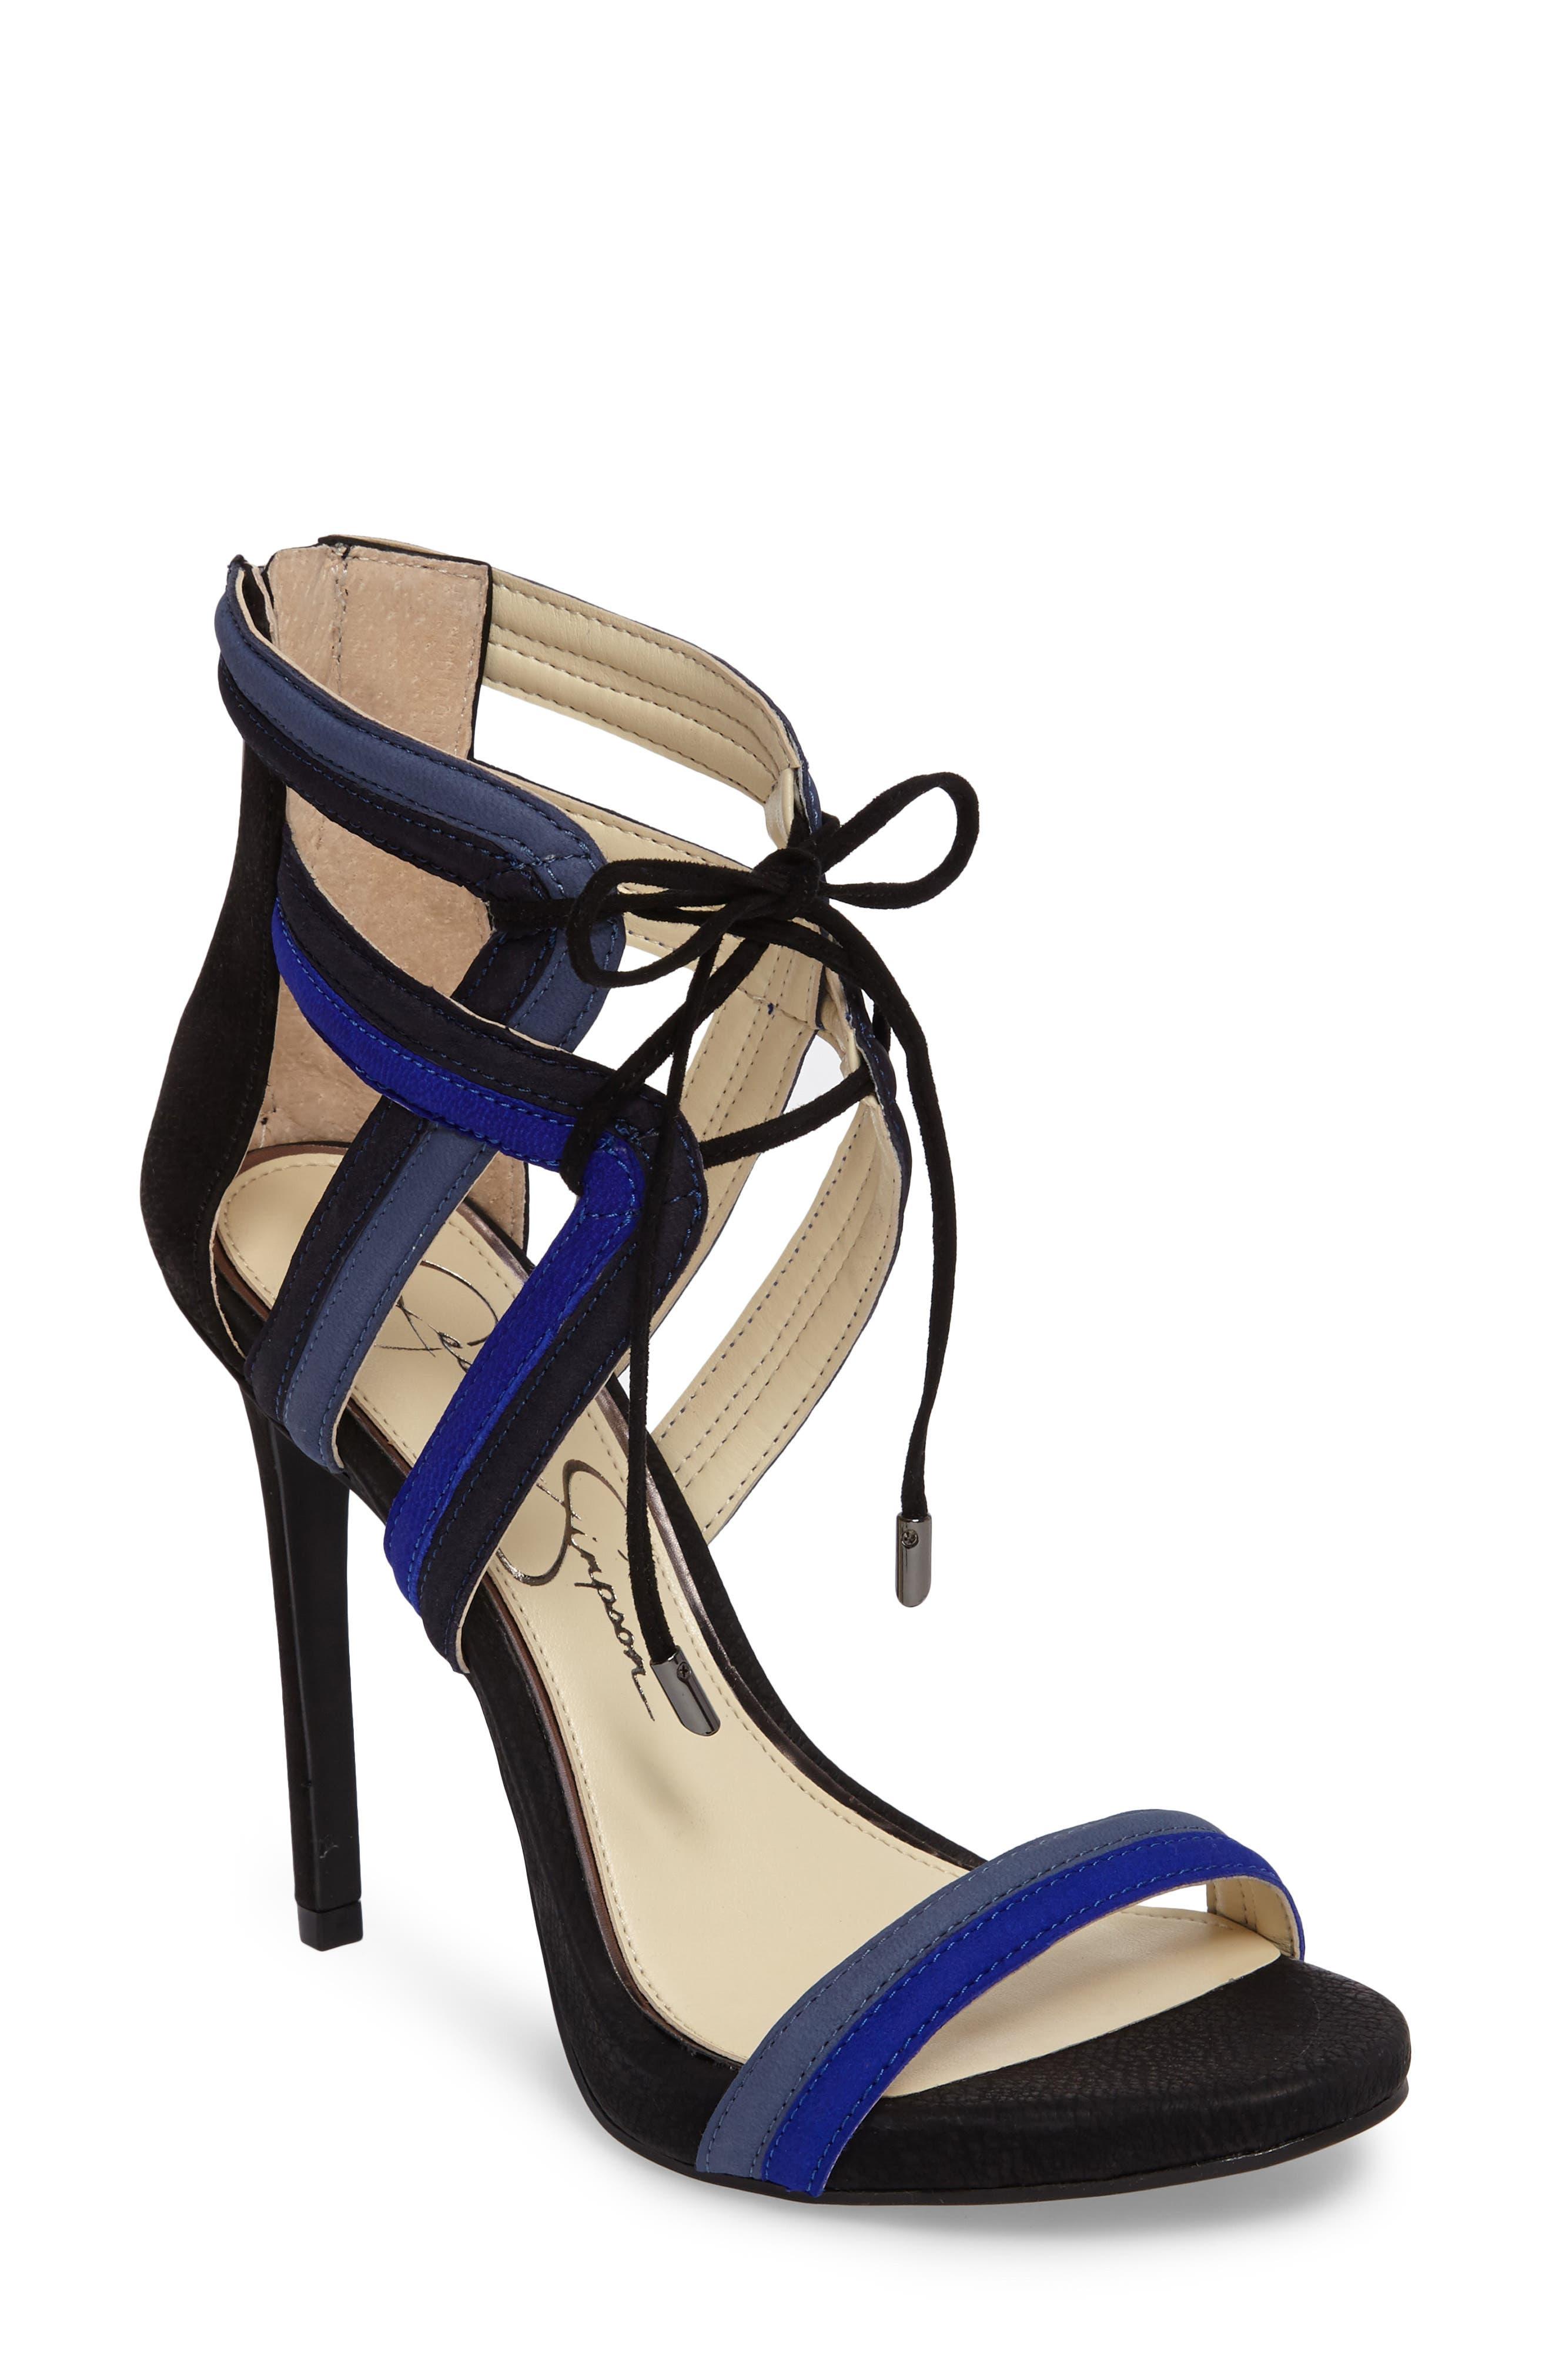 Rensa Sandal,                             Main thumbnail 1, color,                             Blue Violet